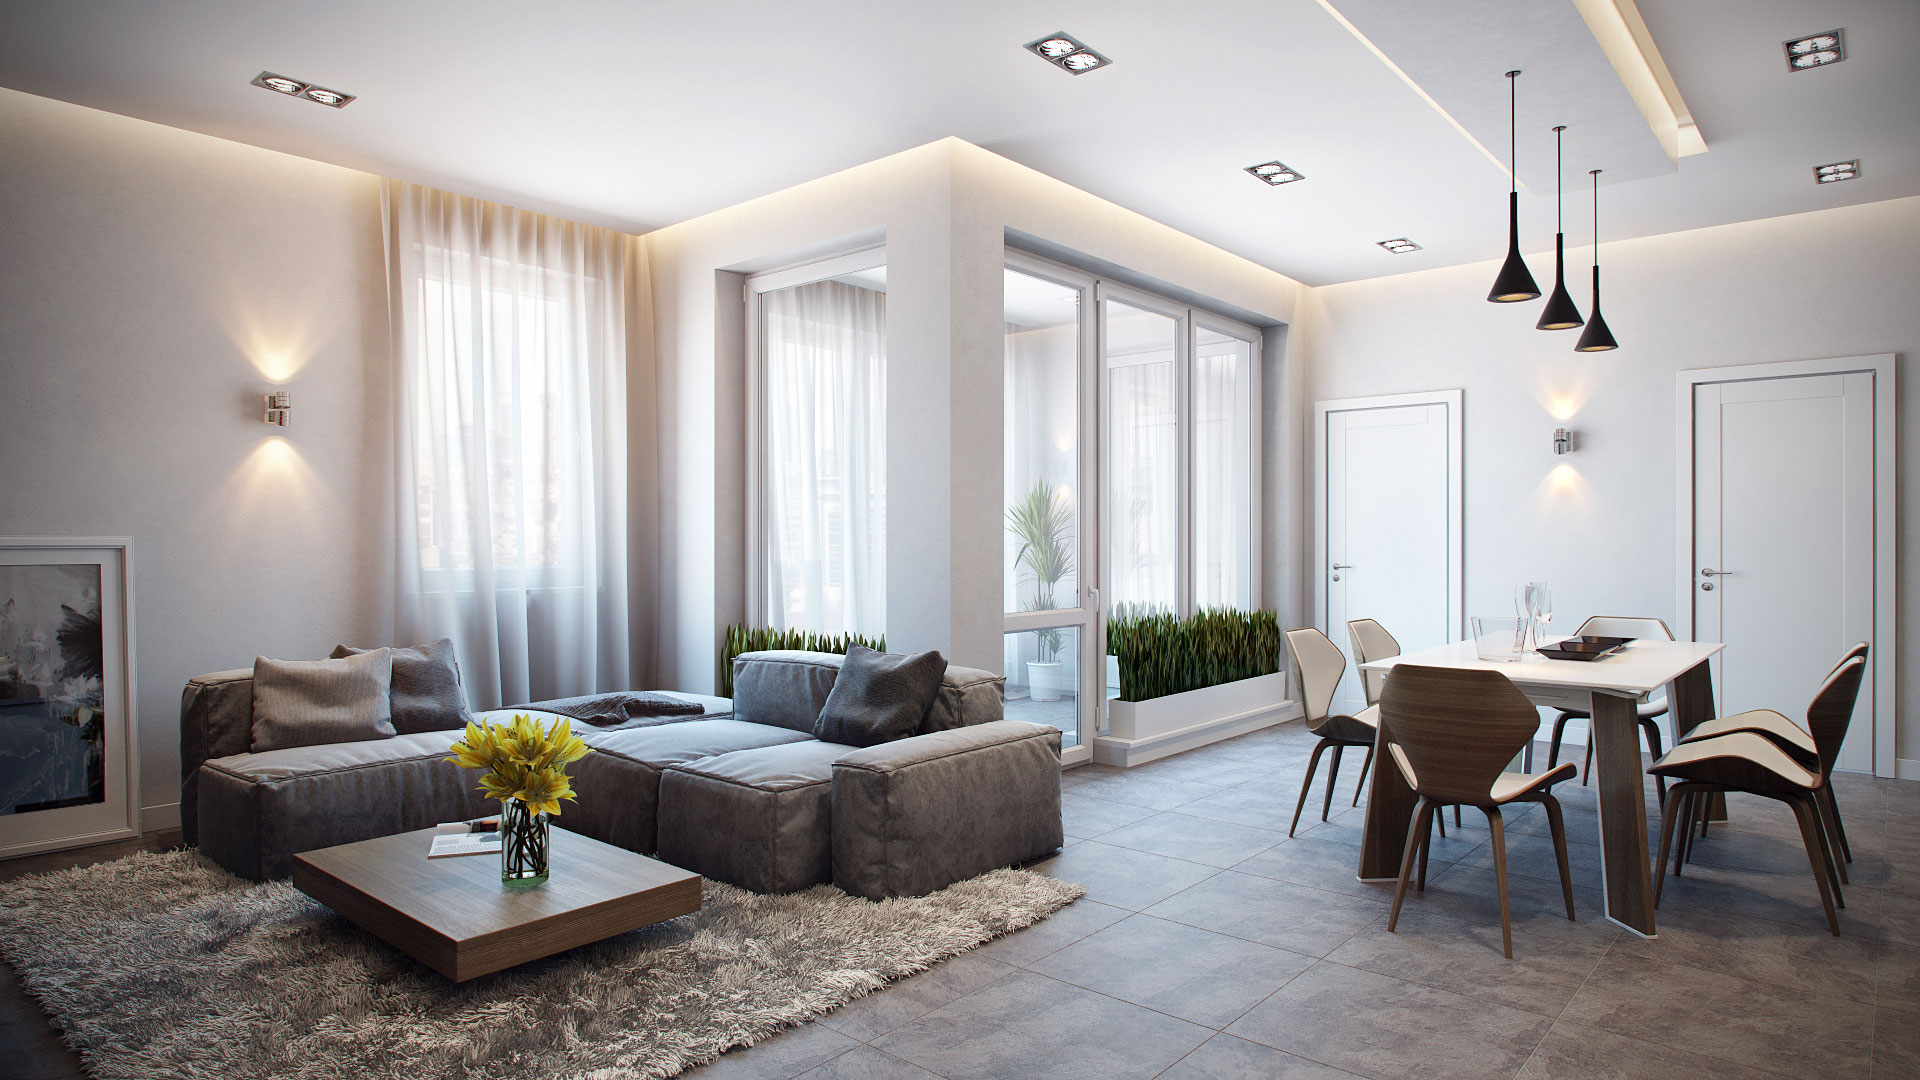 Ev dekorasyonlar n yapma - Impeccable modern house architecture with playful interior design ...